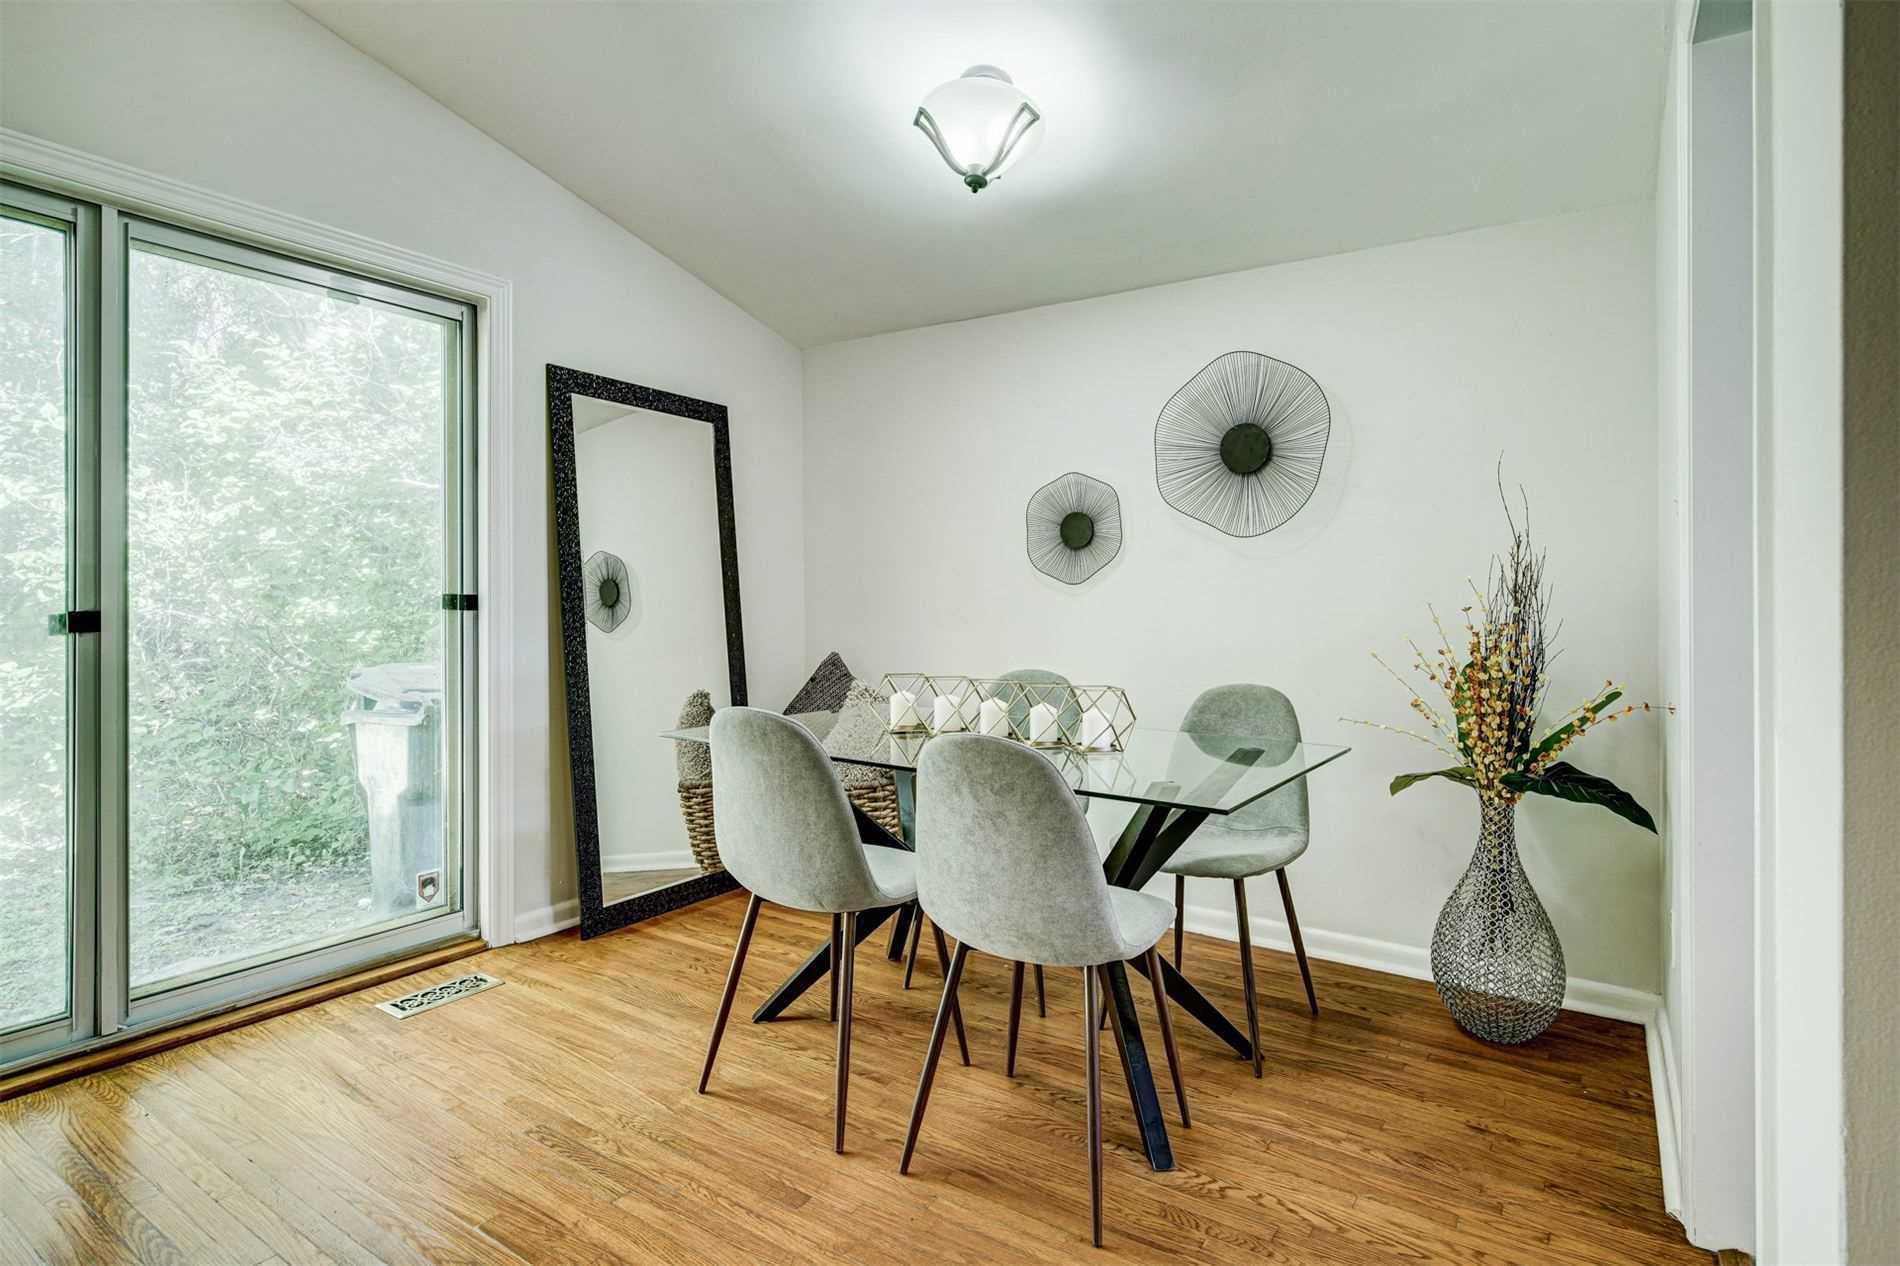 140 Verobeach Blvd - Humbermede Detached for sale, 3 Bedrooms (W5385046) - #9